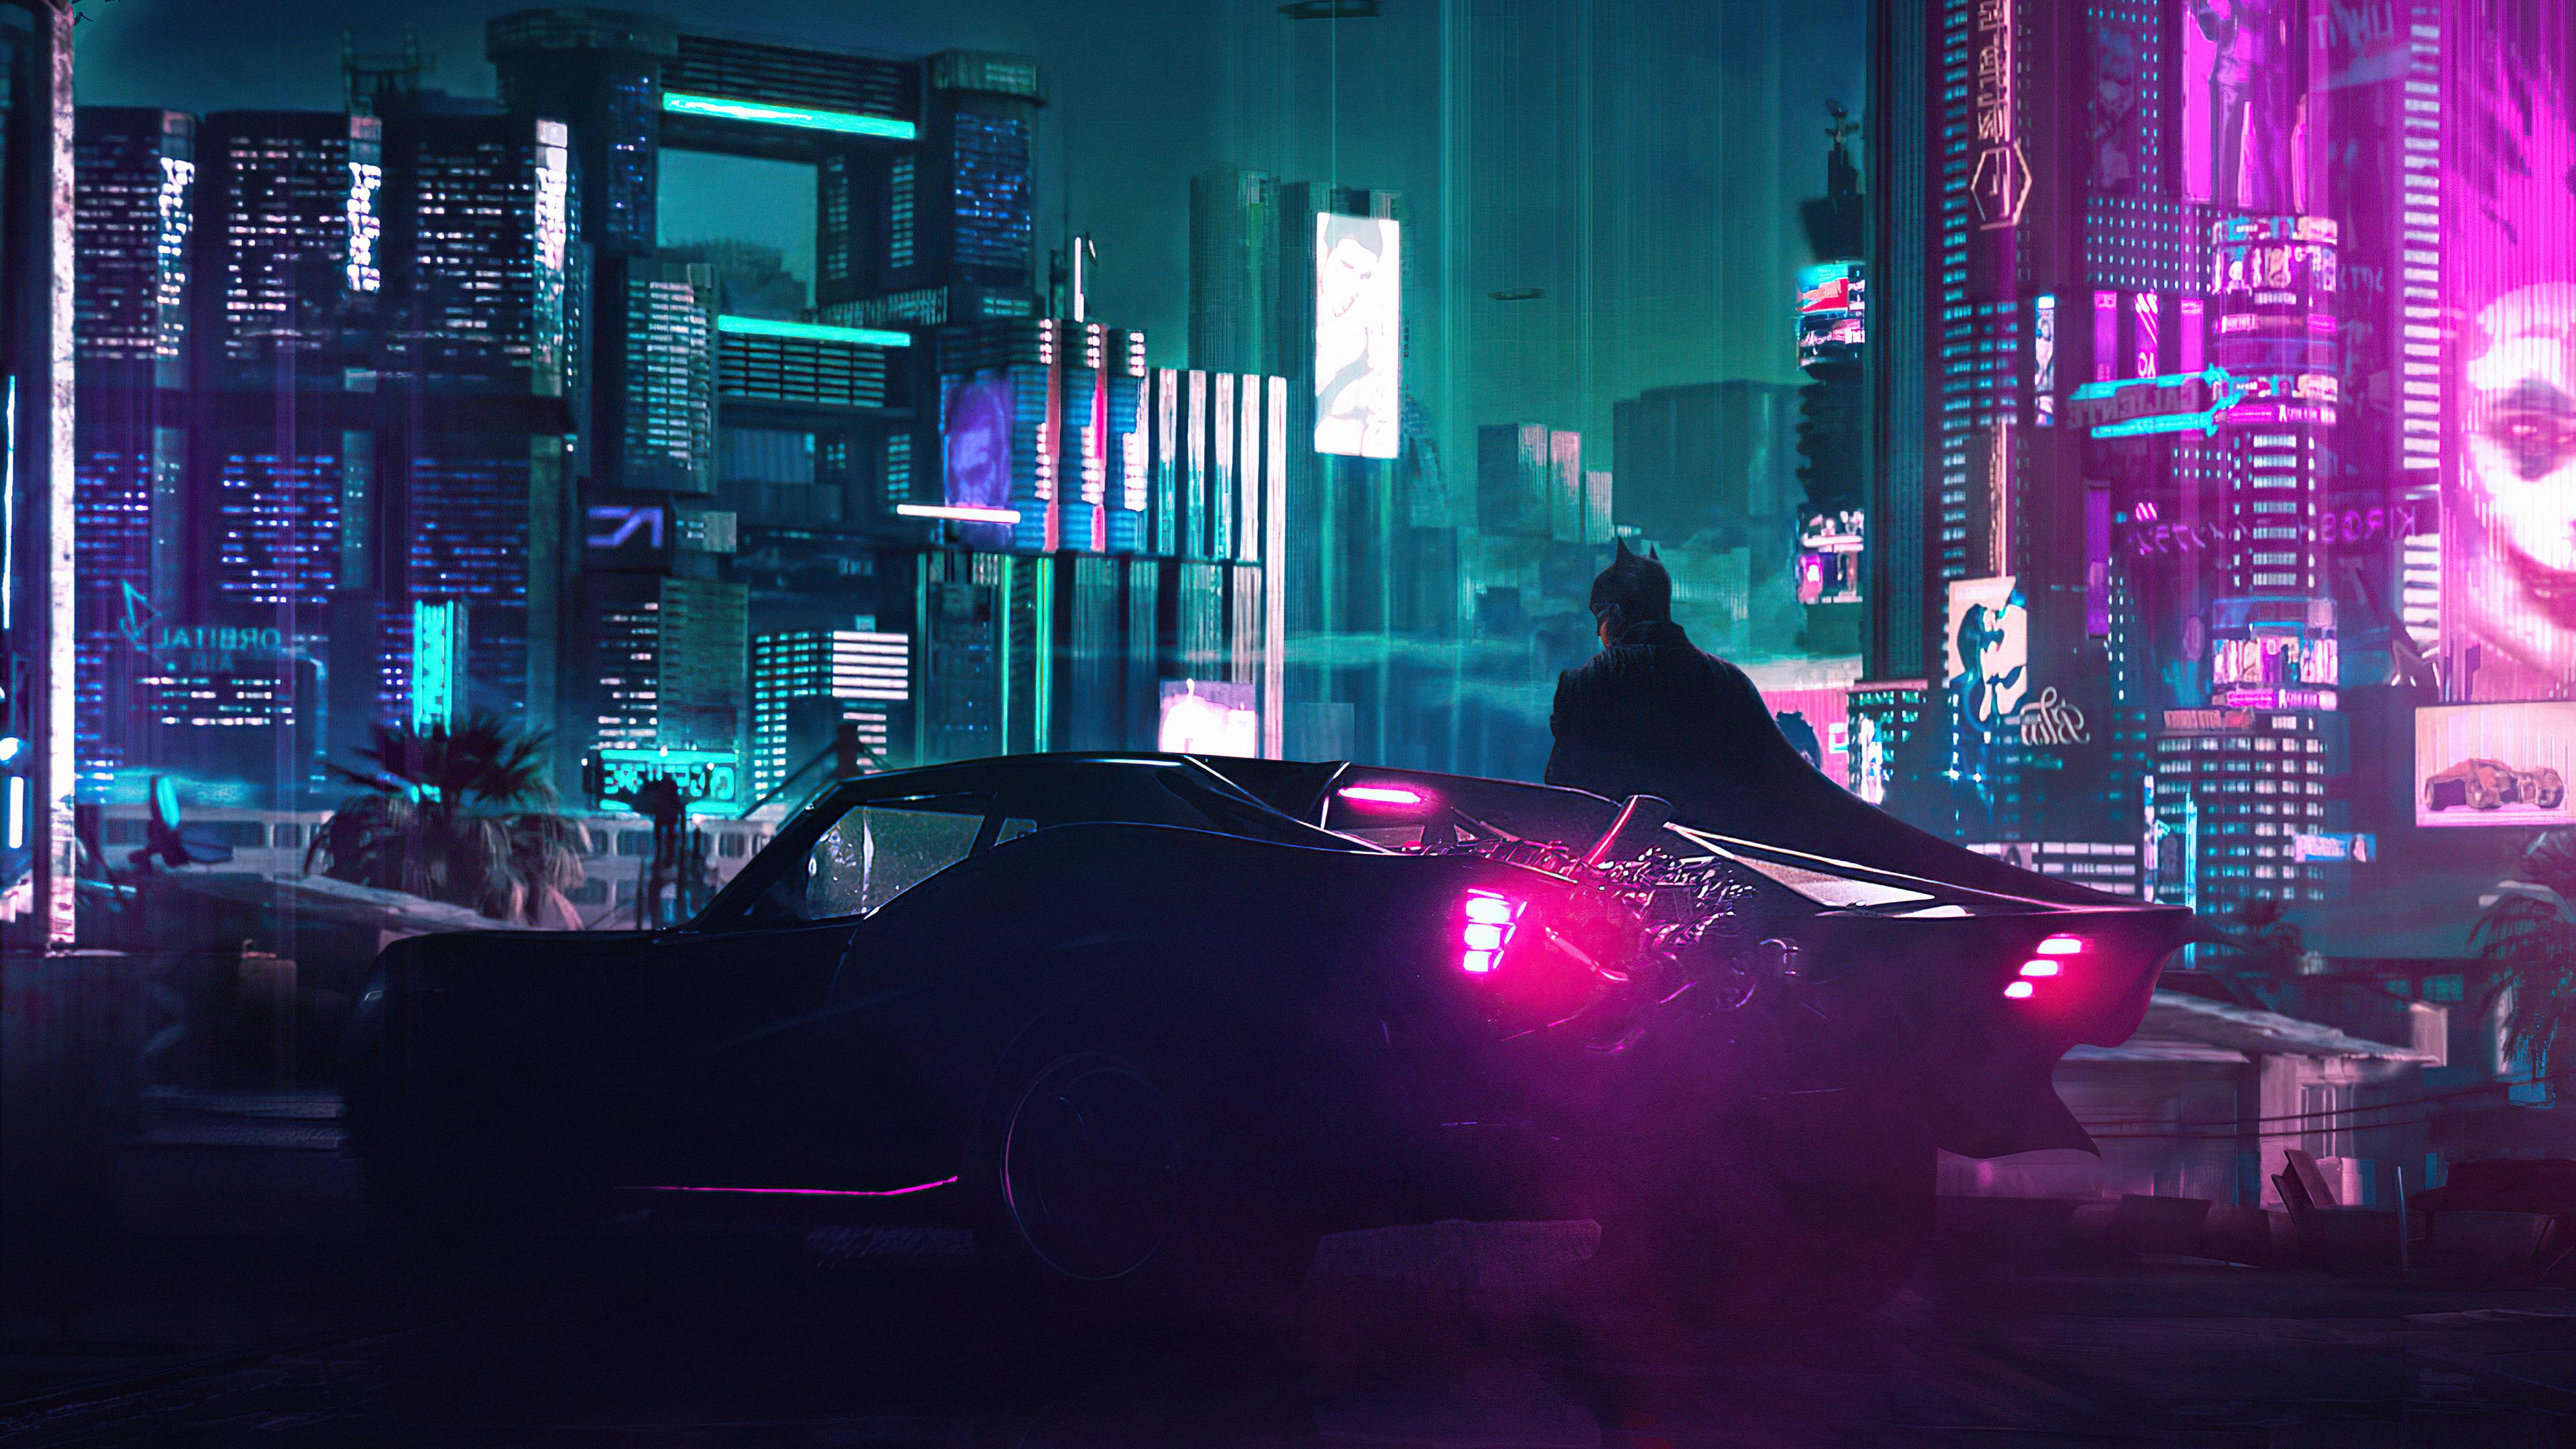 cyberpunk x the batman 4k 1615195602 - Cyberpunk X The Batman 4k - Cyberpunk X The Batman 4k wallpapers